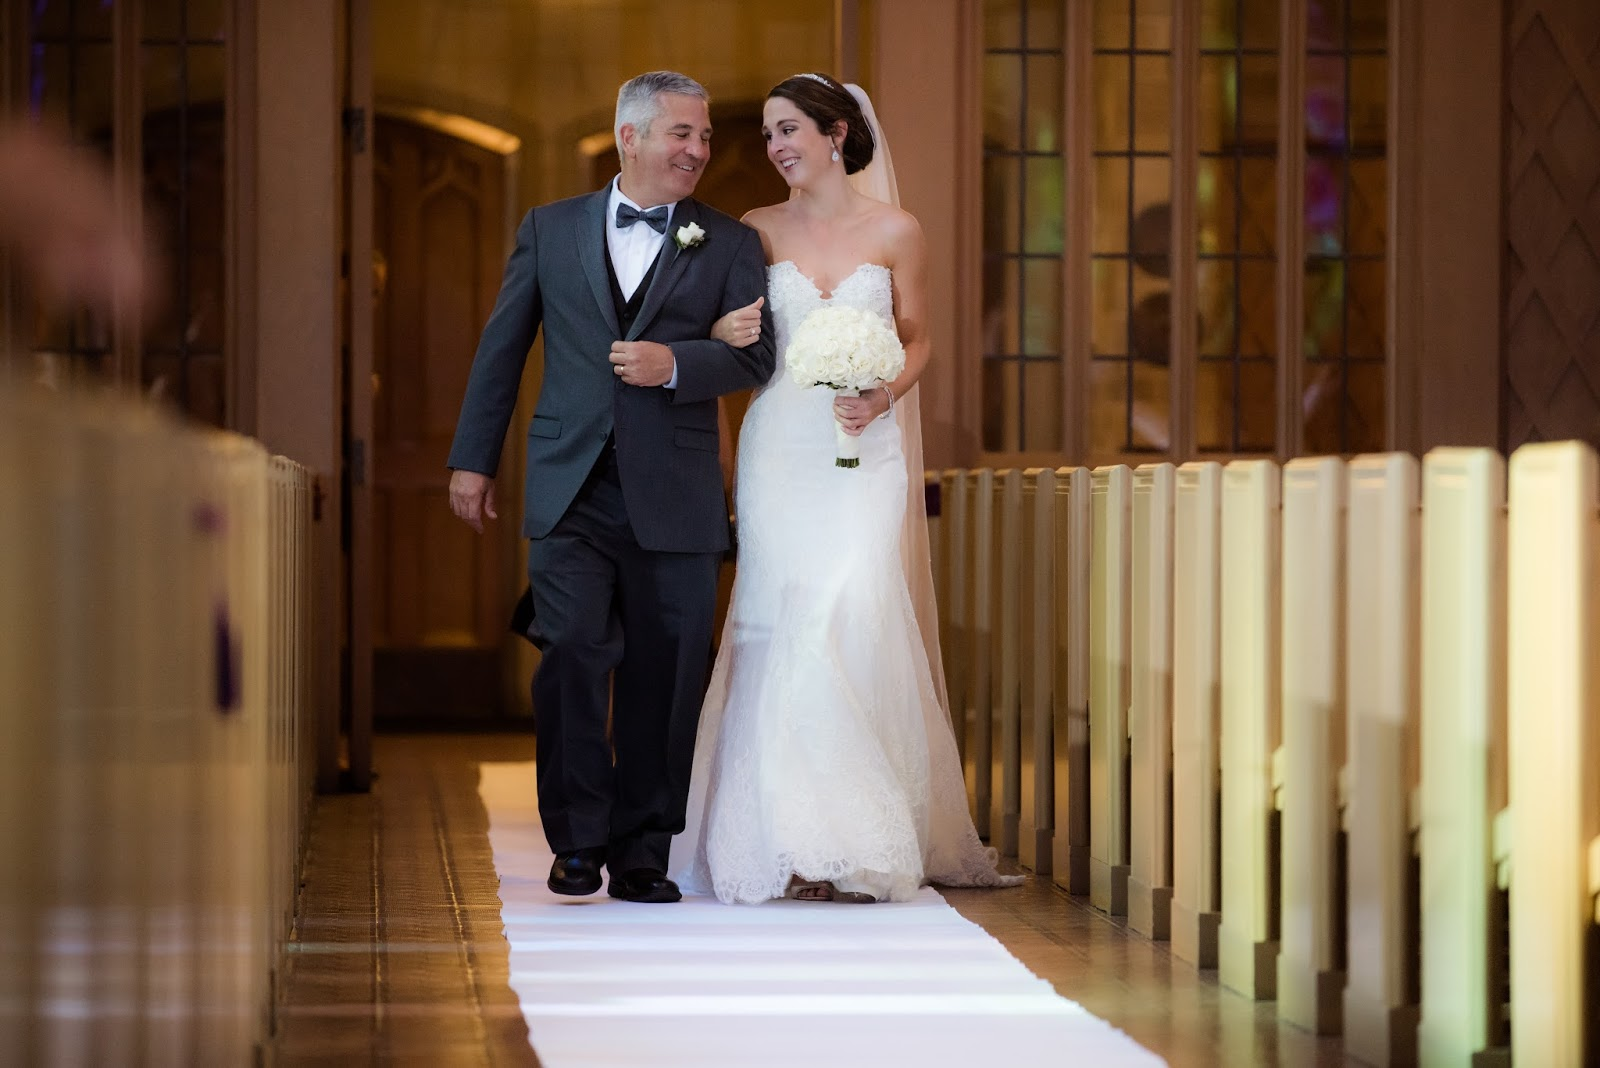 chicagostyle weddings